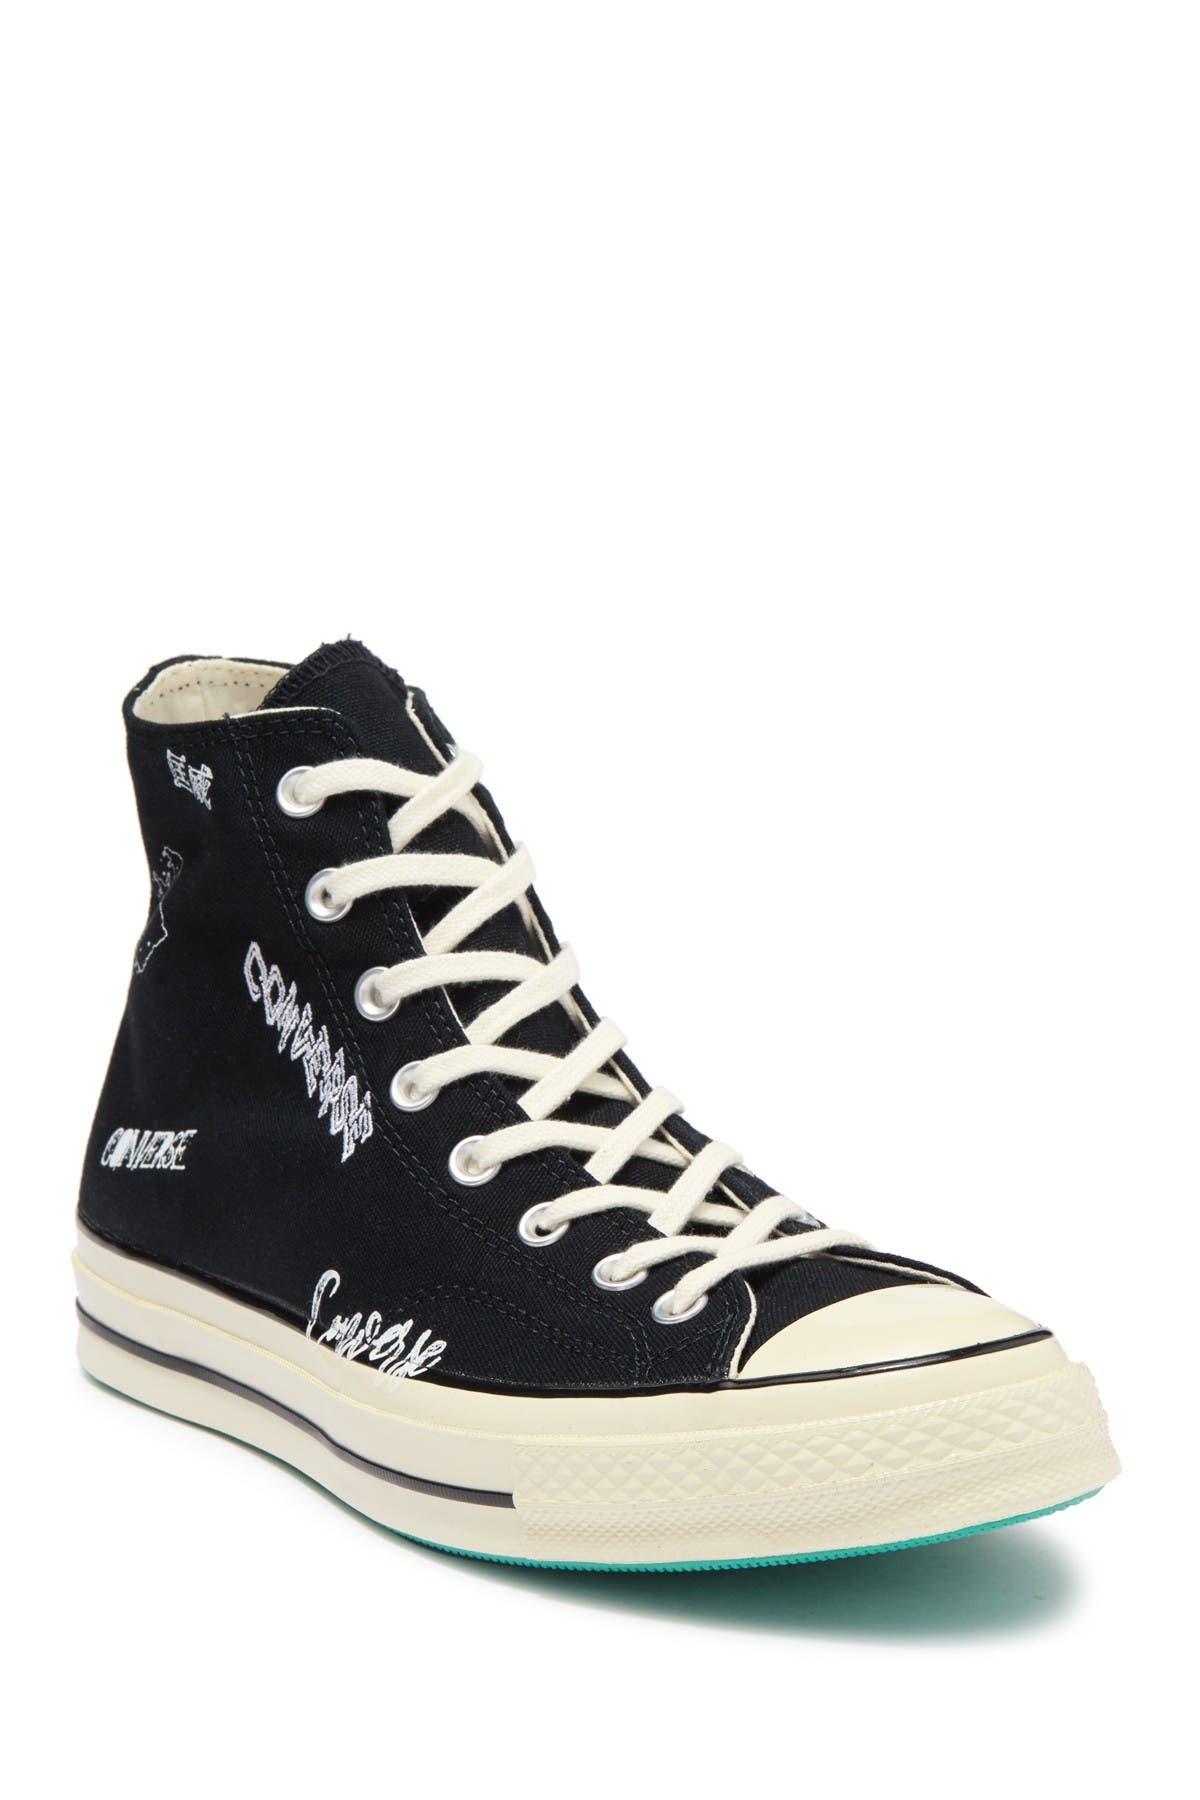 Image of Converse Chuck 70's High Top Sneaker